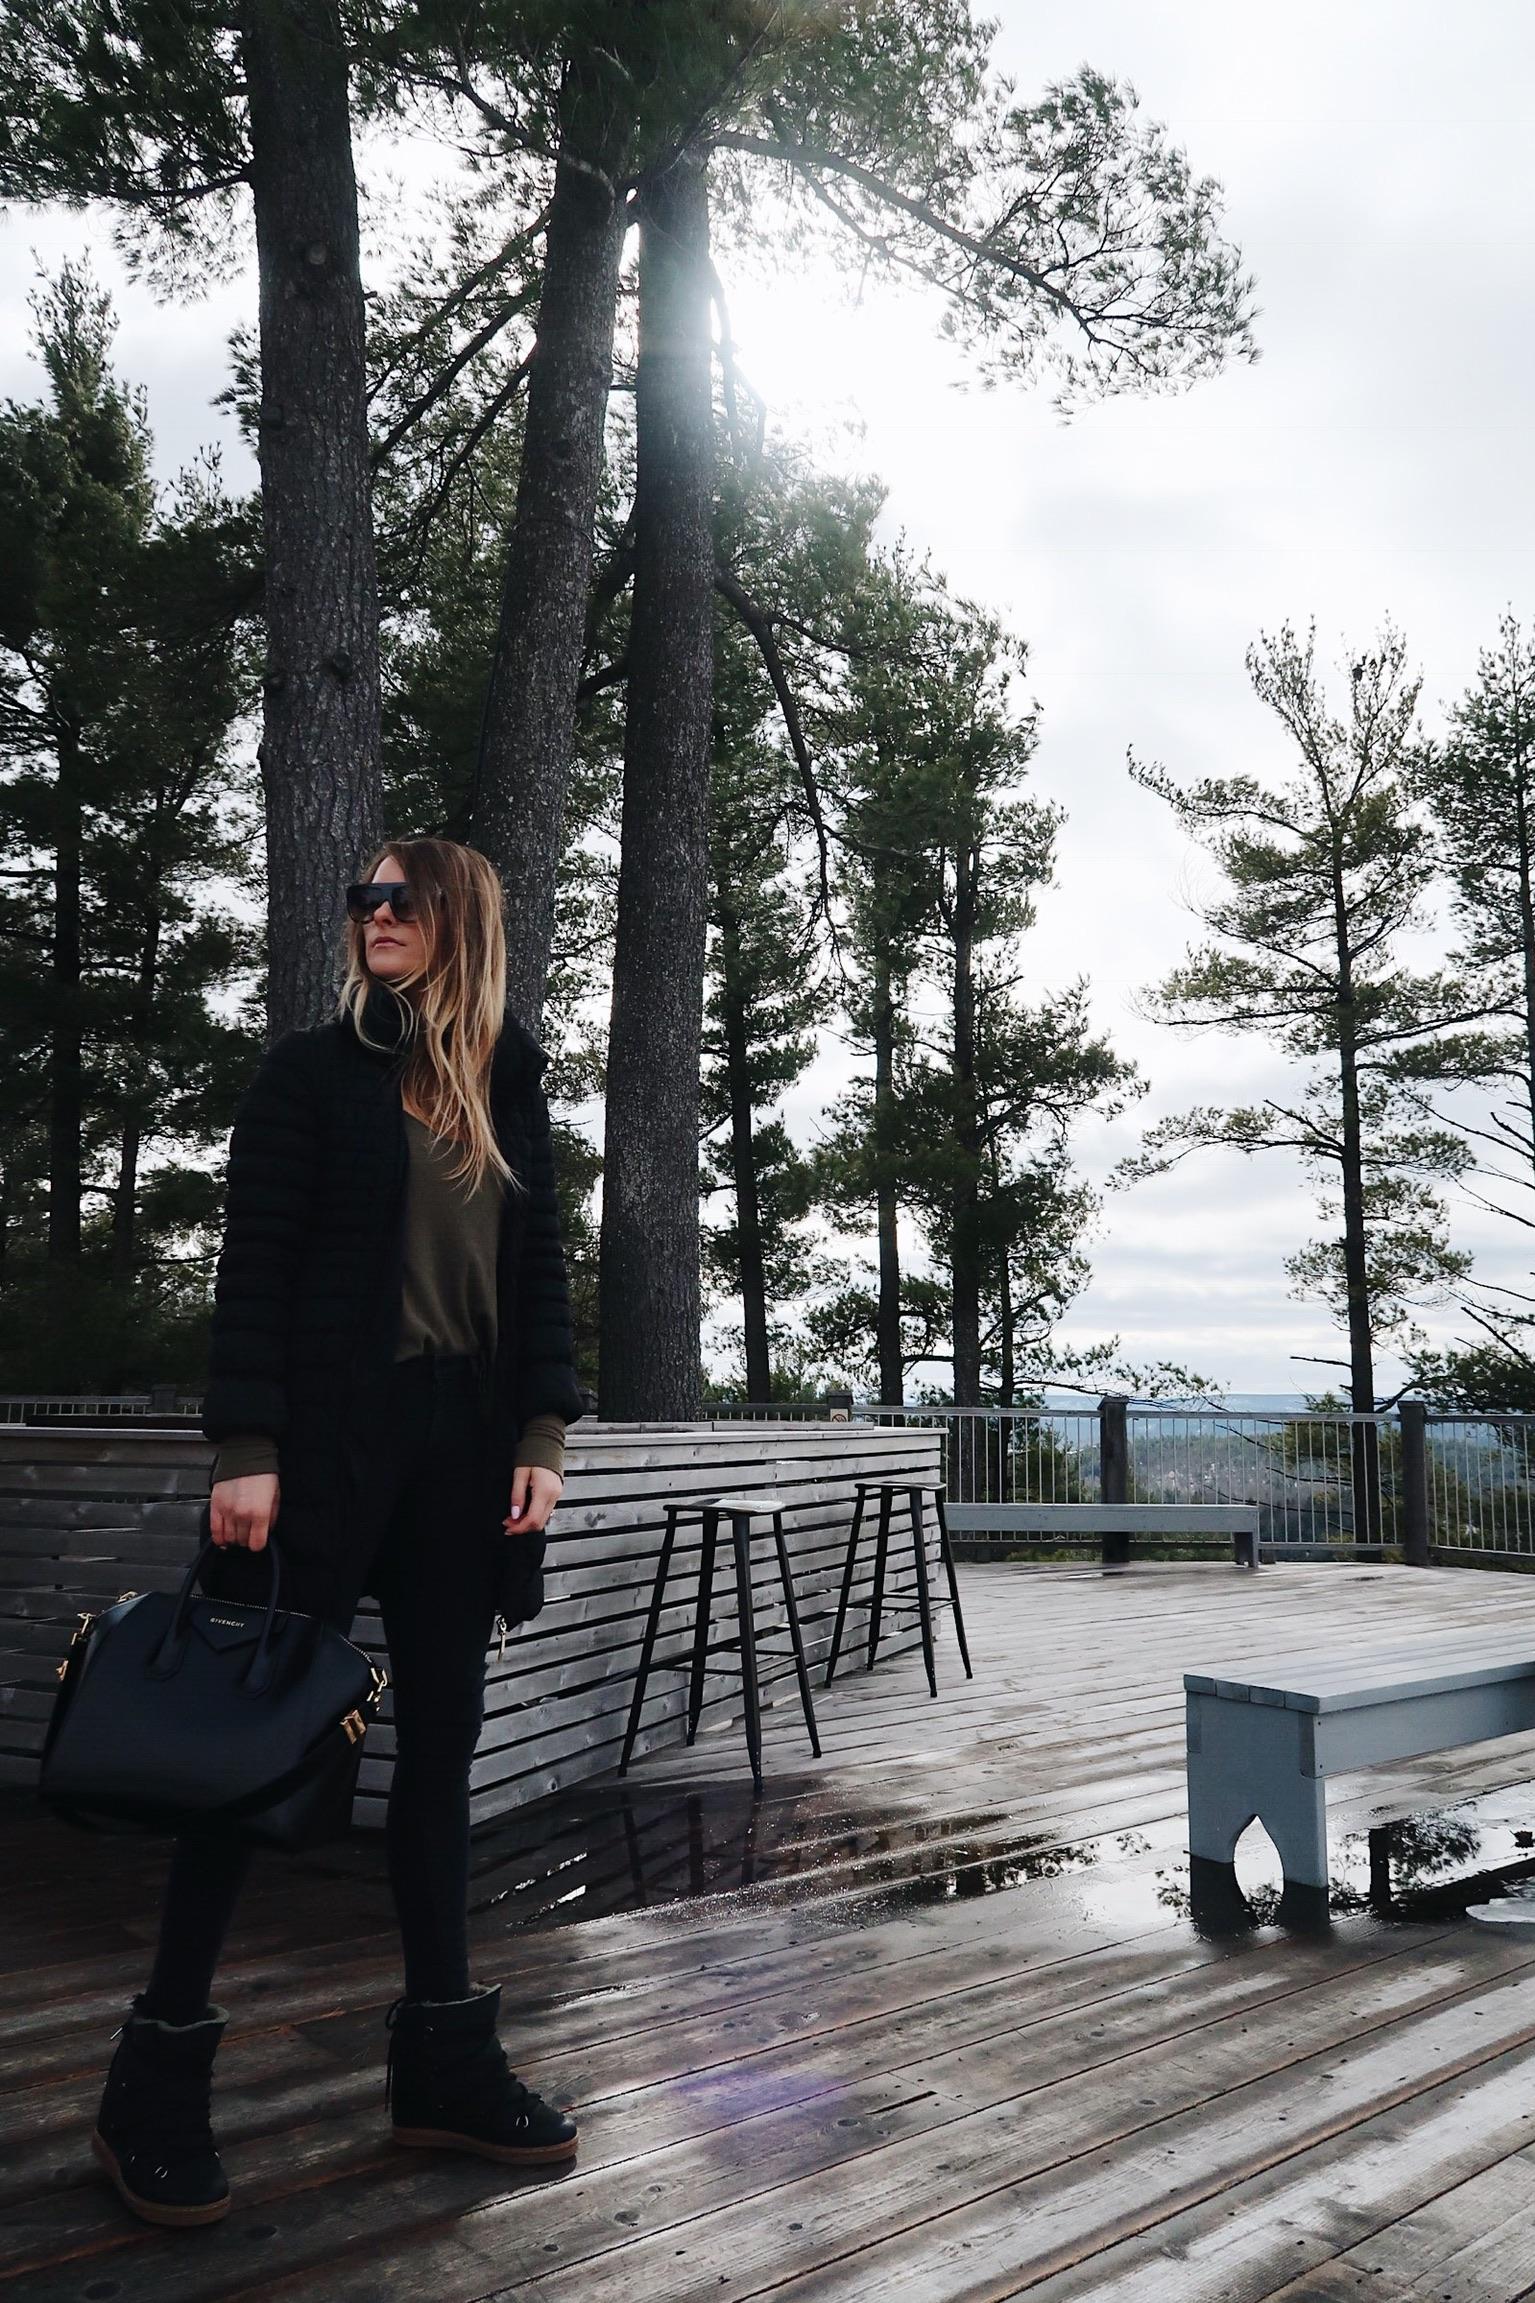 life with aco, Isabel maranta boots, Givenchy antigona, winter outfit